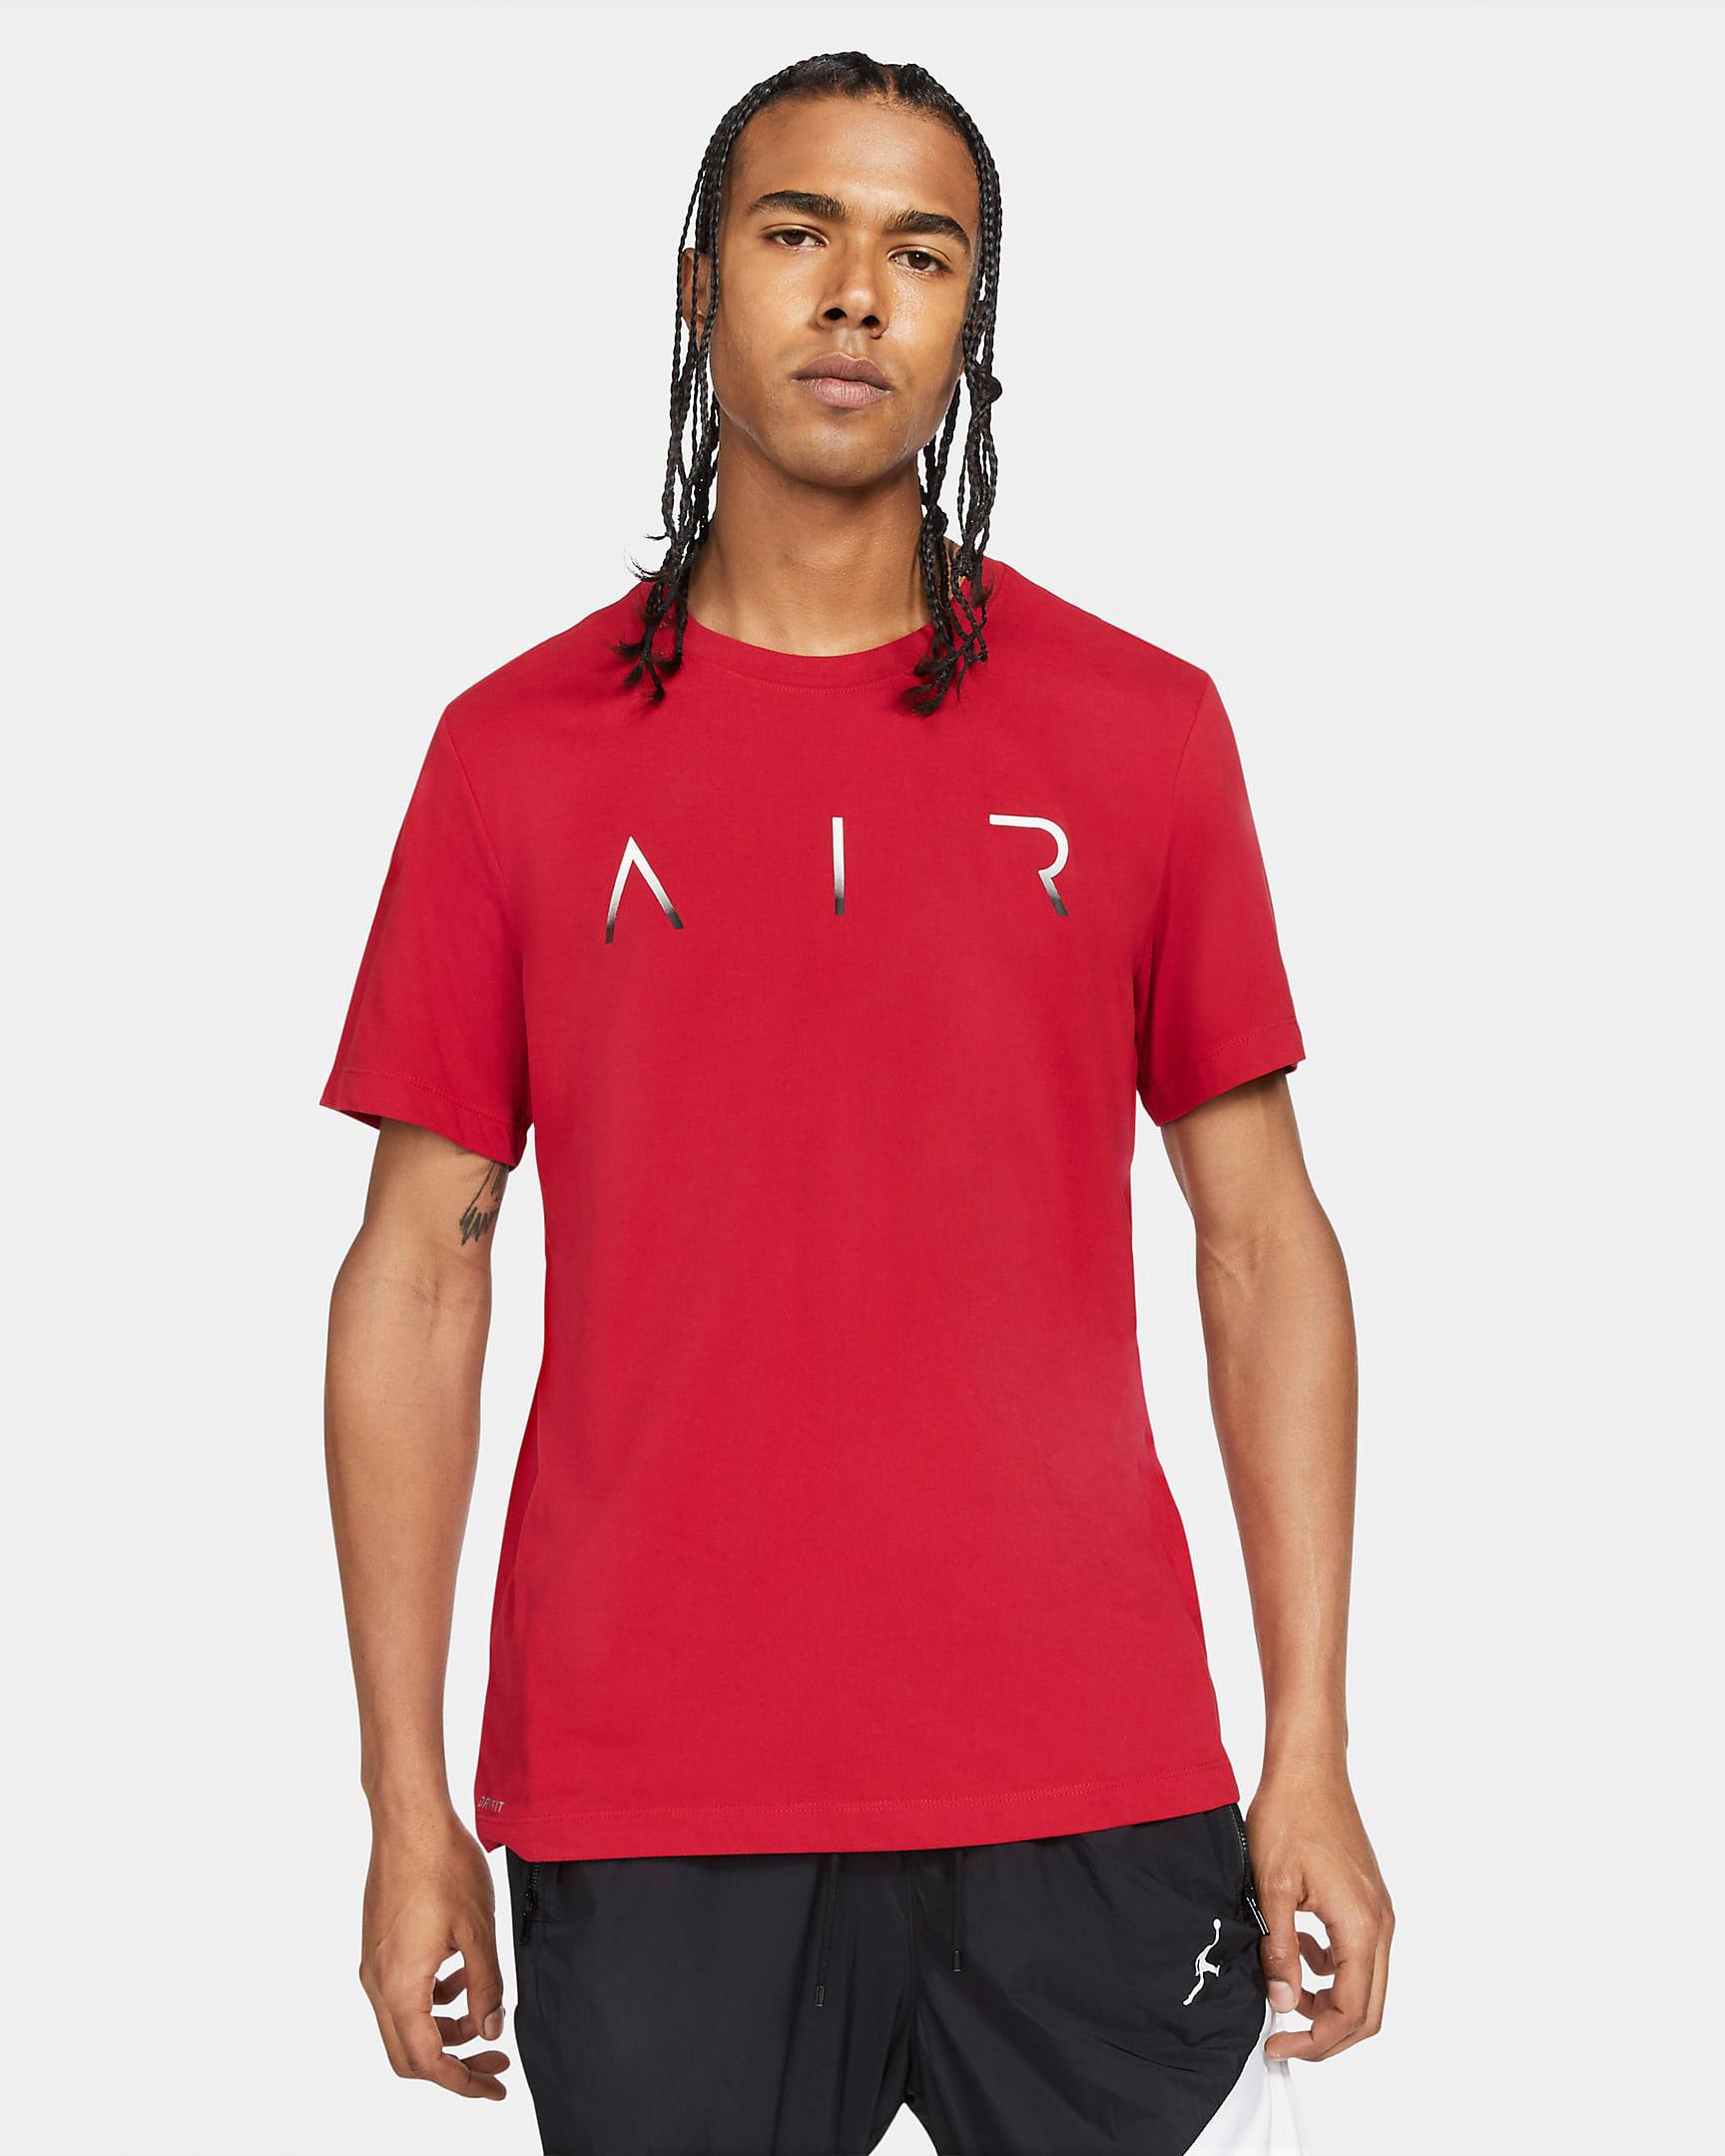 jordan-jumpman-air-t-shirt-gym-red-black-1